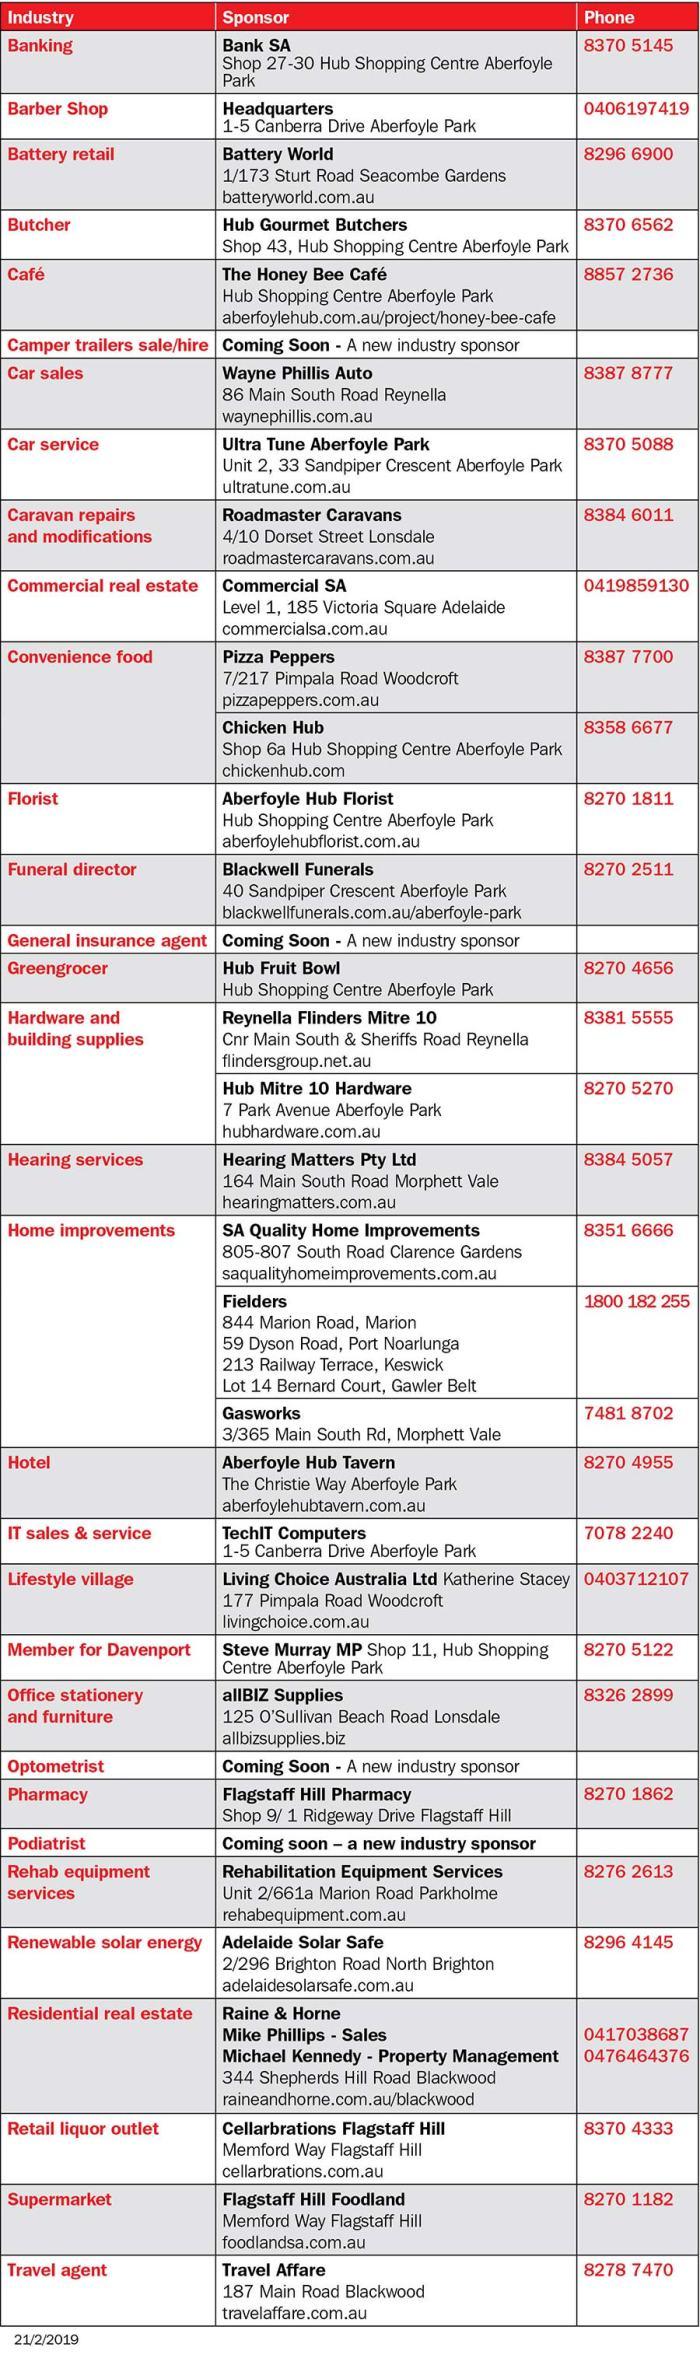 HVBC-Sponsors-Web-21-2-19